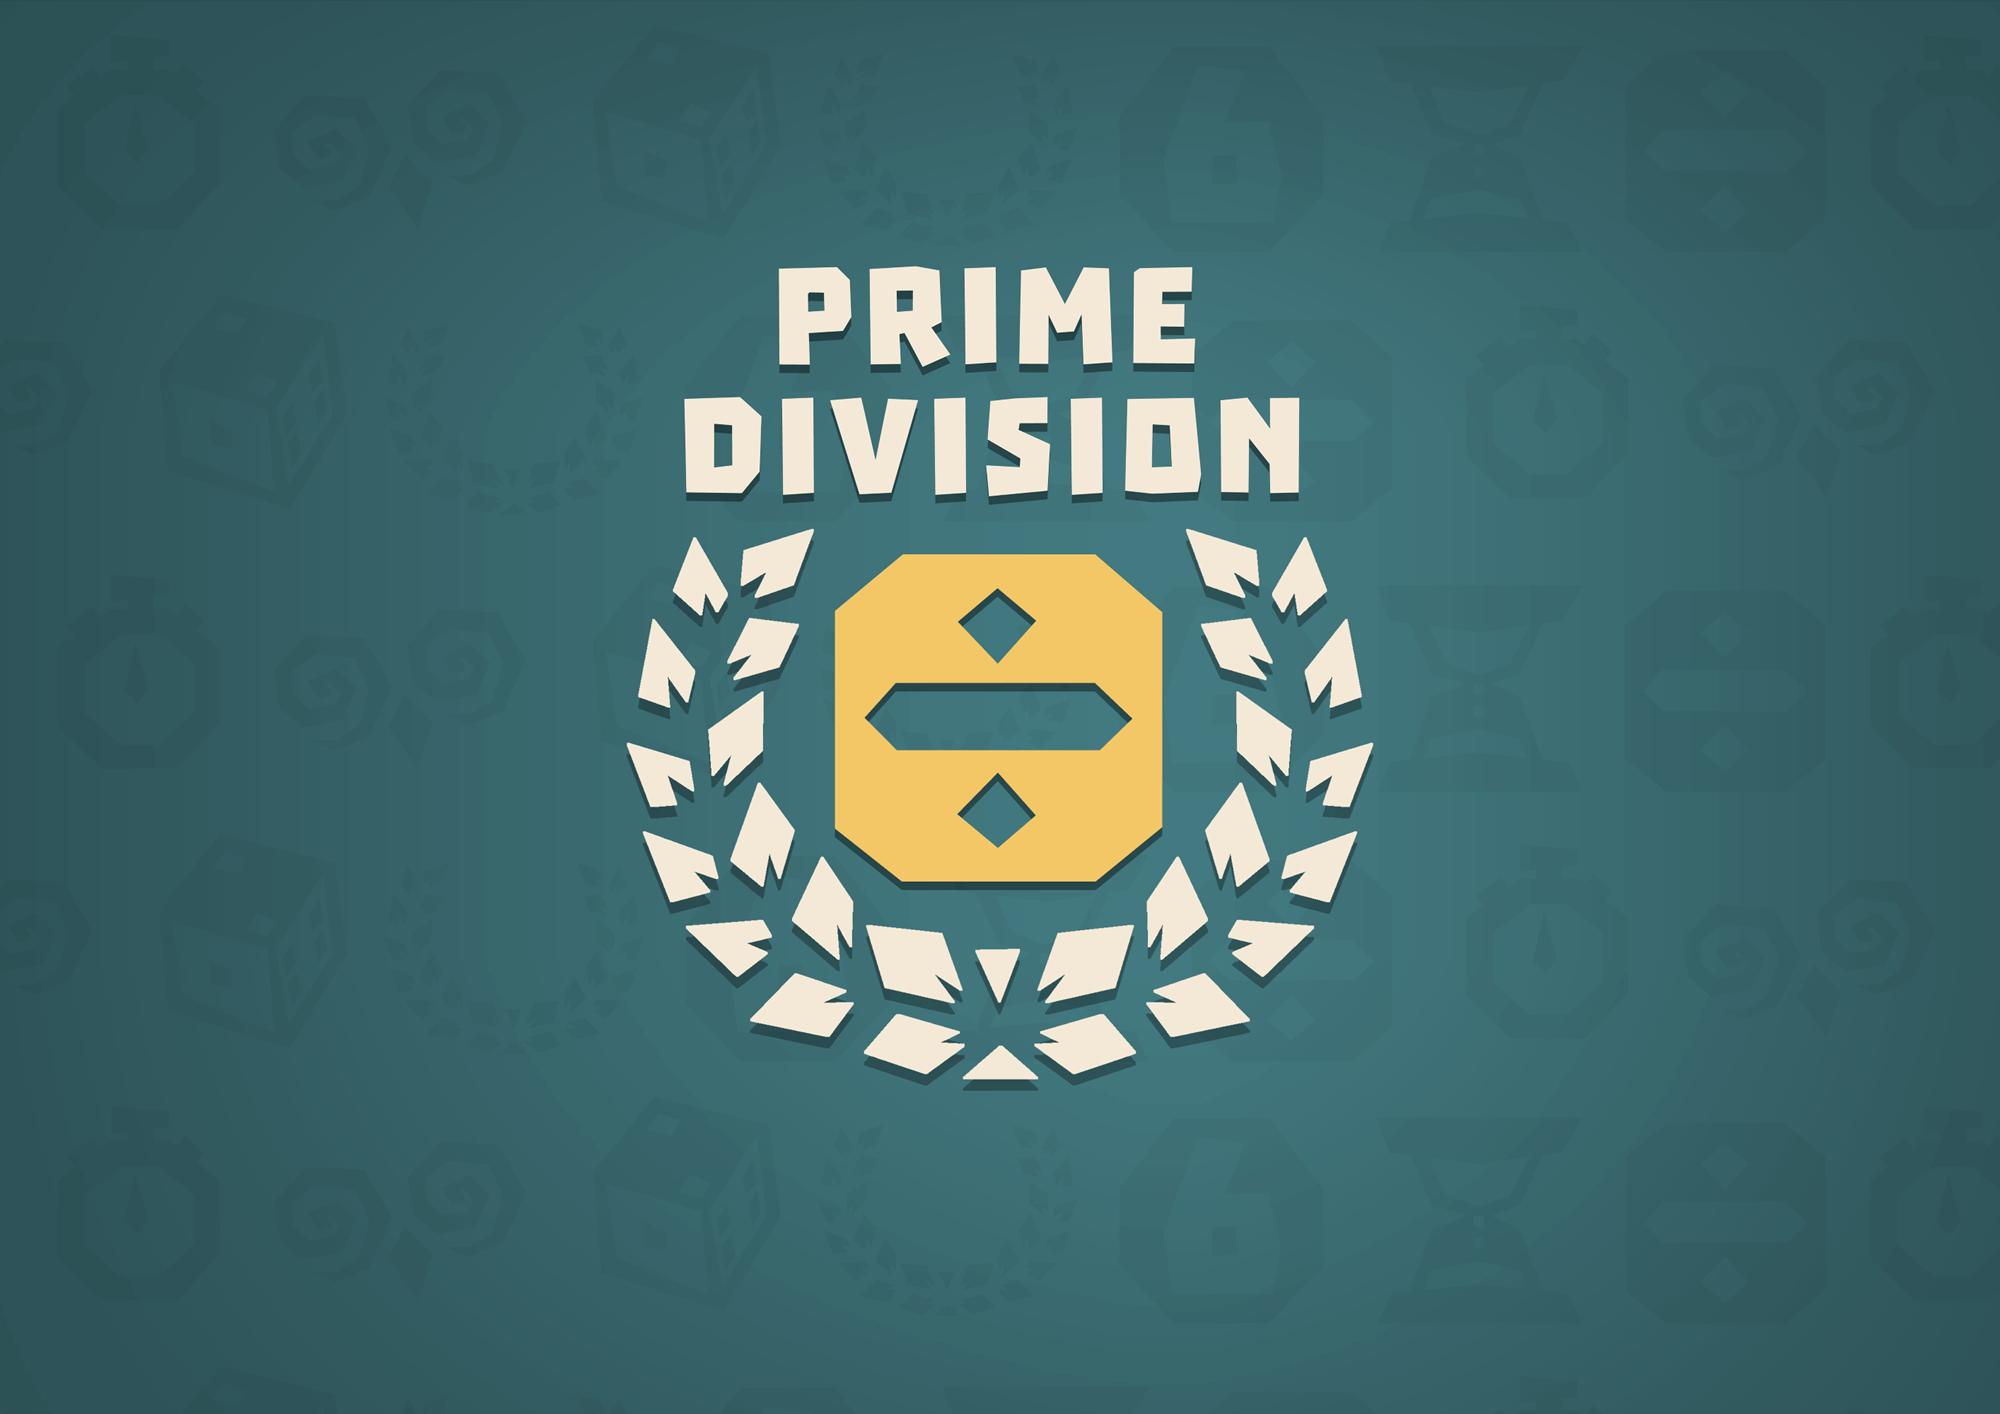 Prime Division